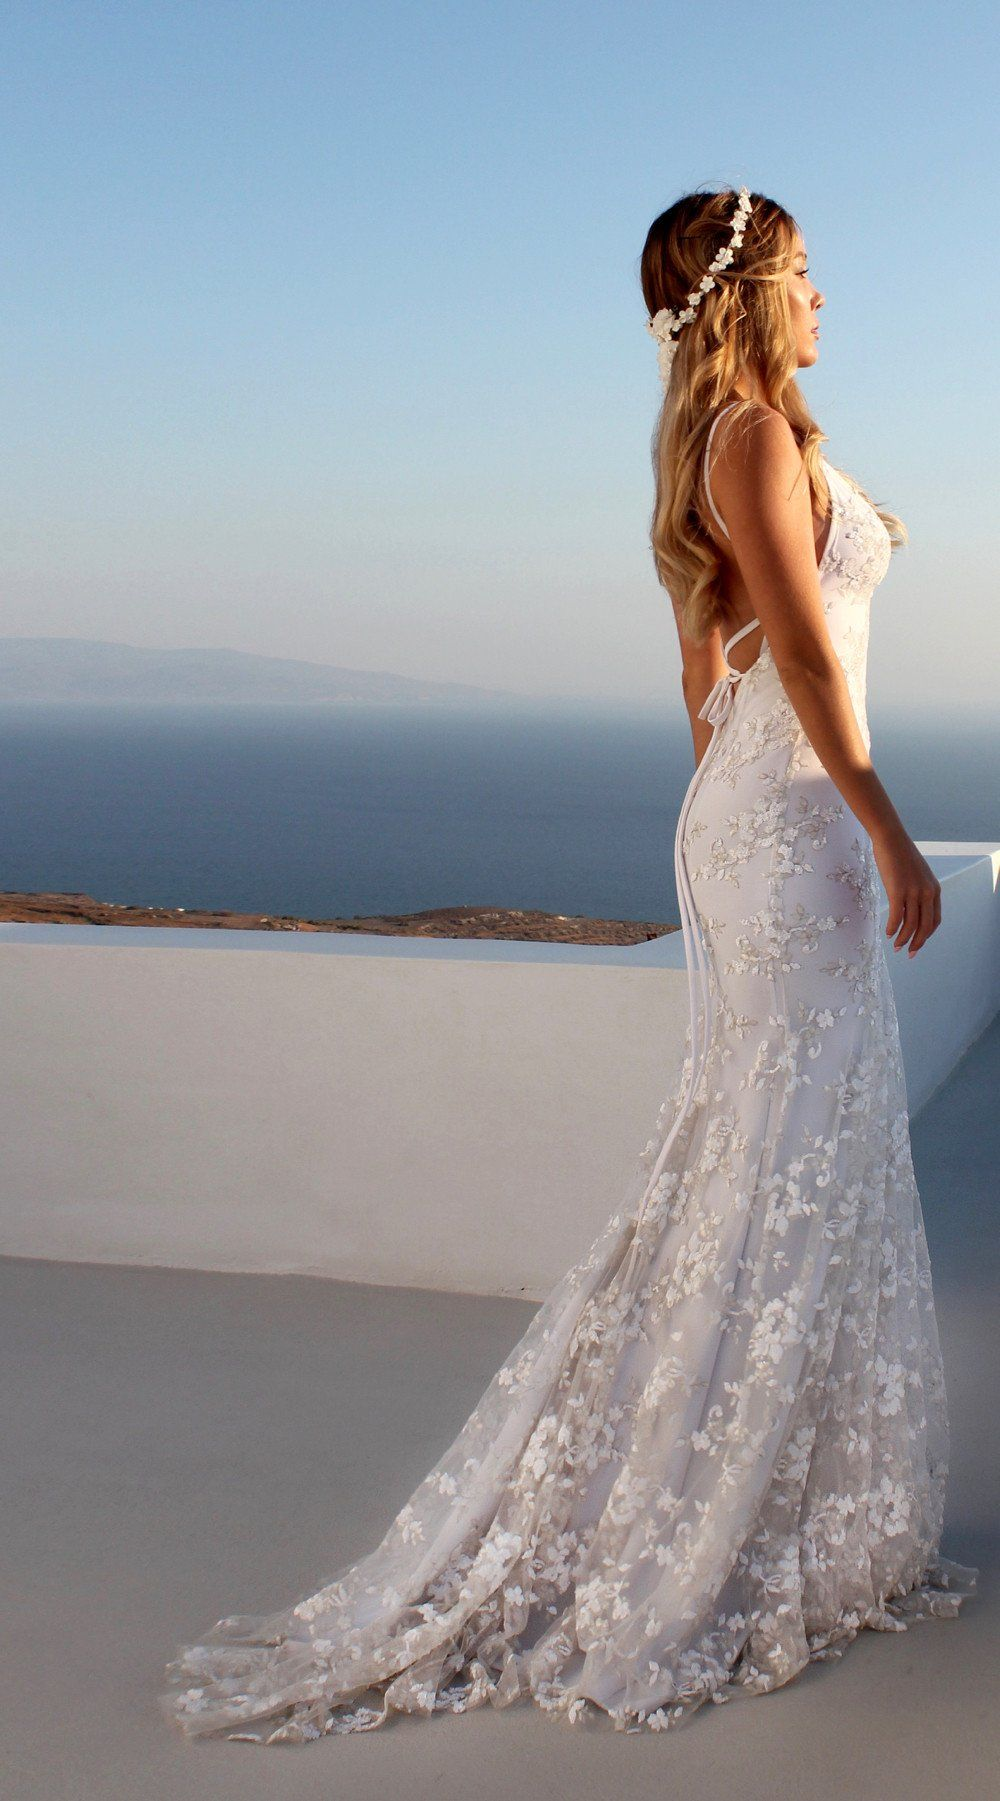 WHITE JADORE Mermaid beach wedding dresses, Prom dresses